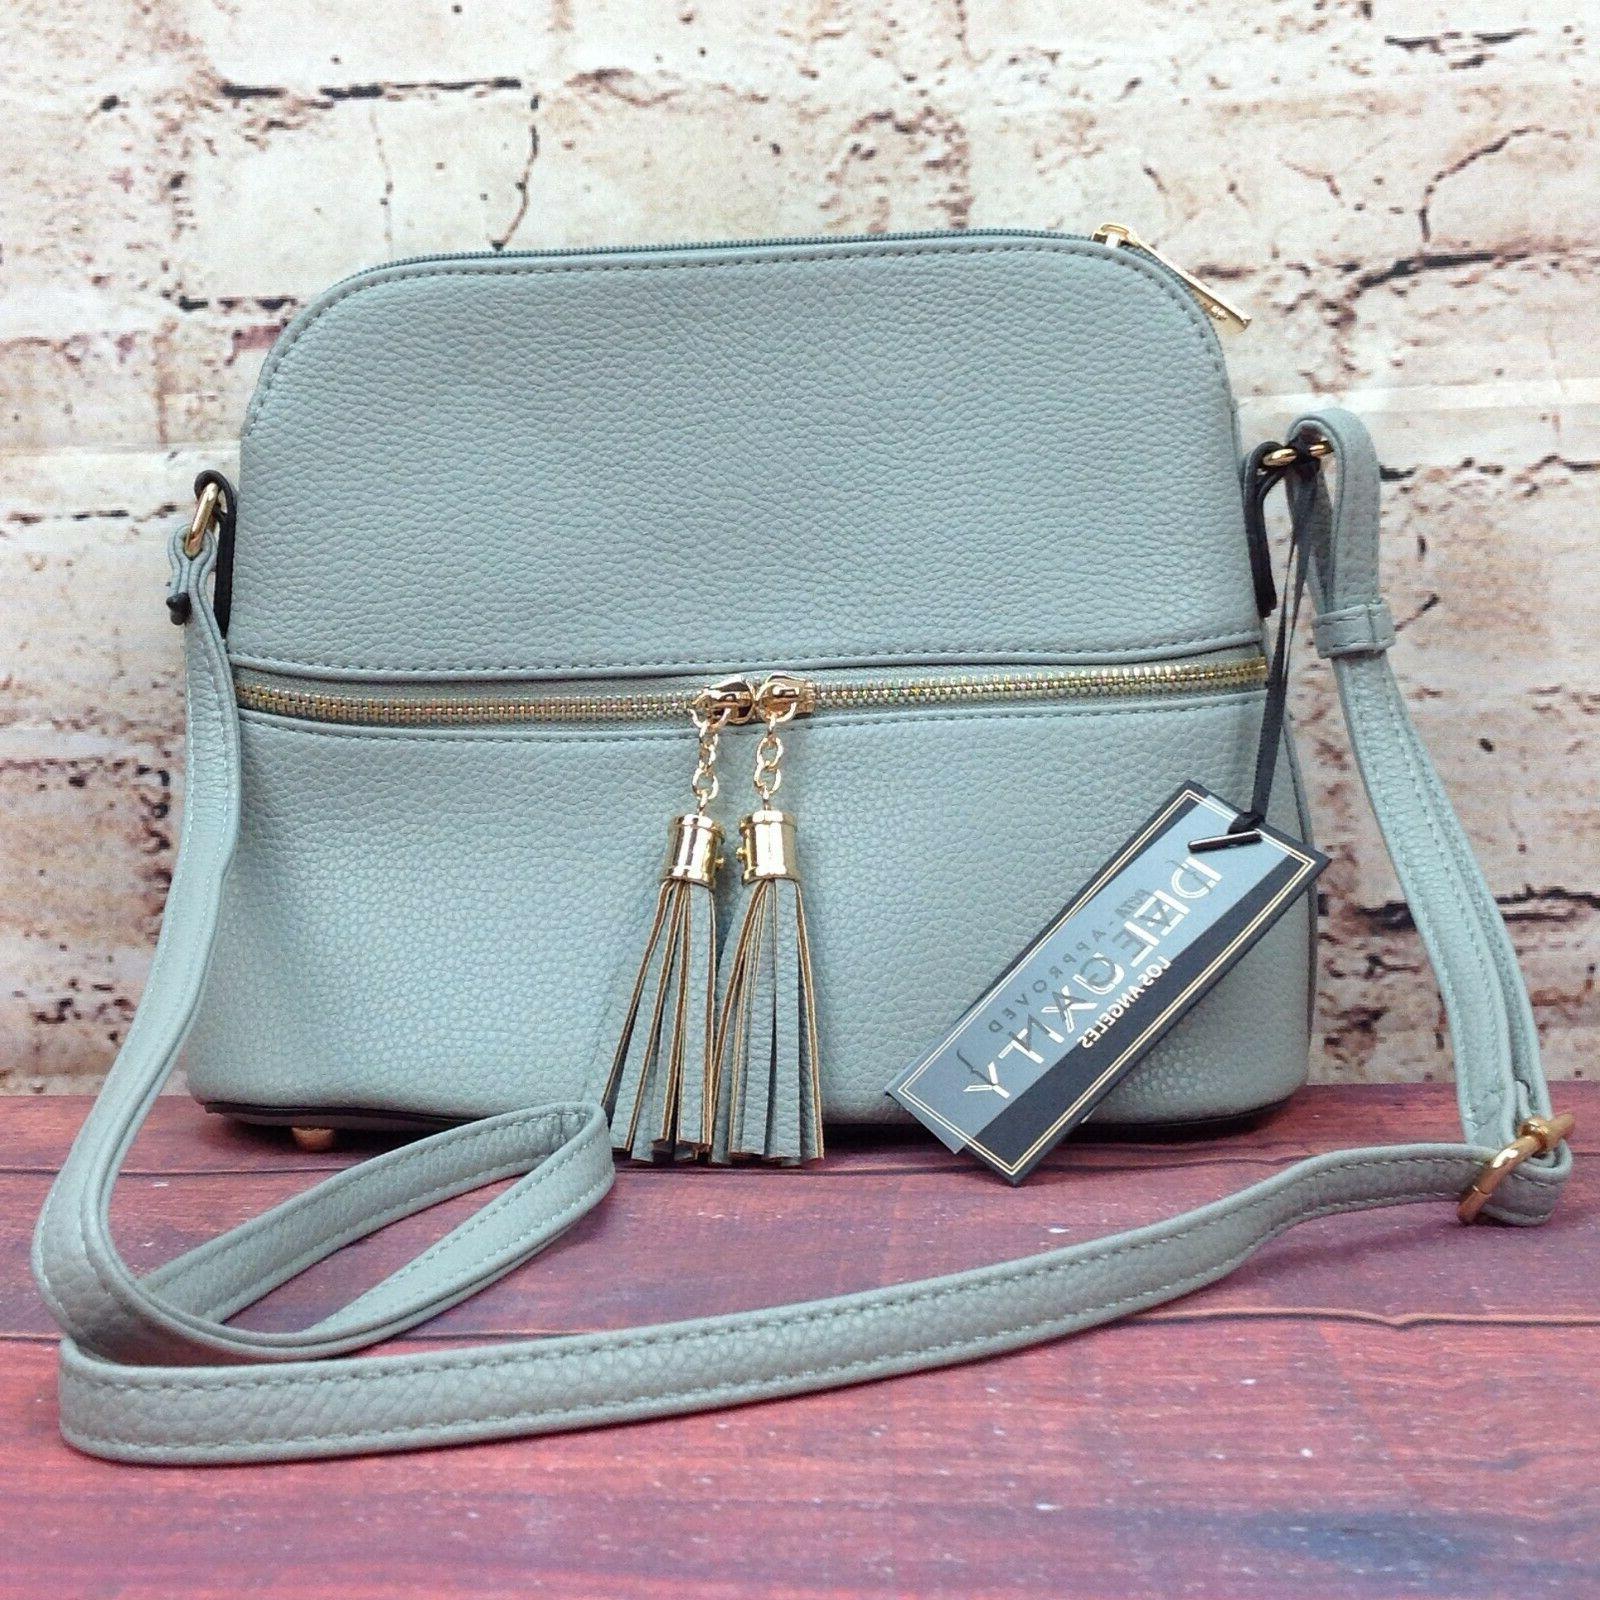 bella tassel charm purse gray crossbody medium